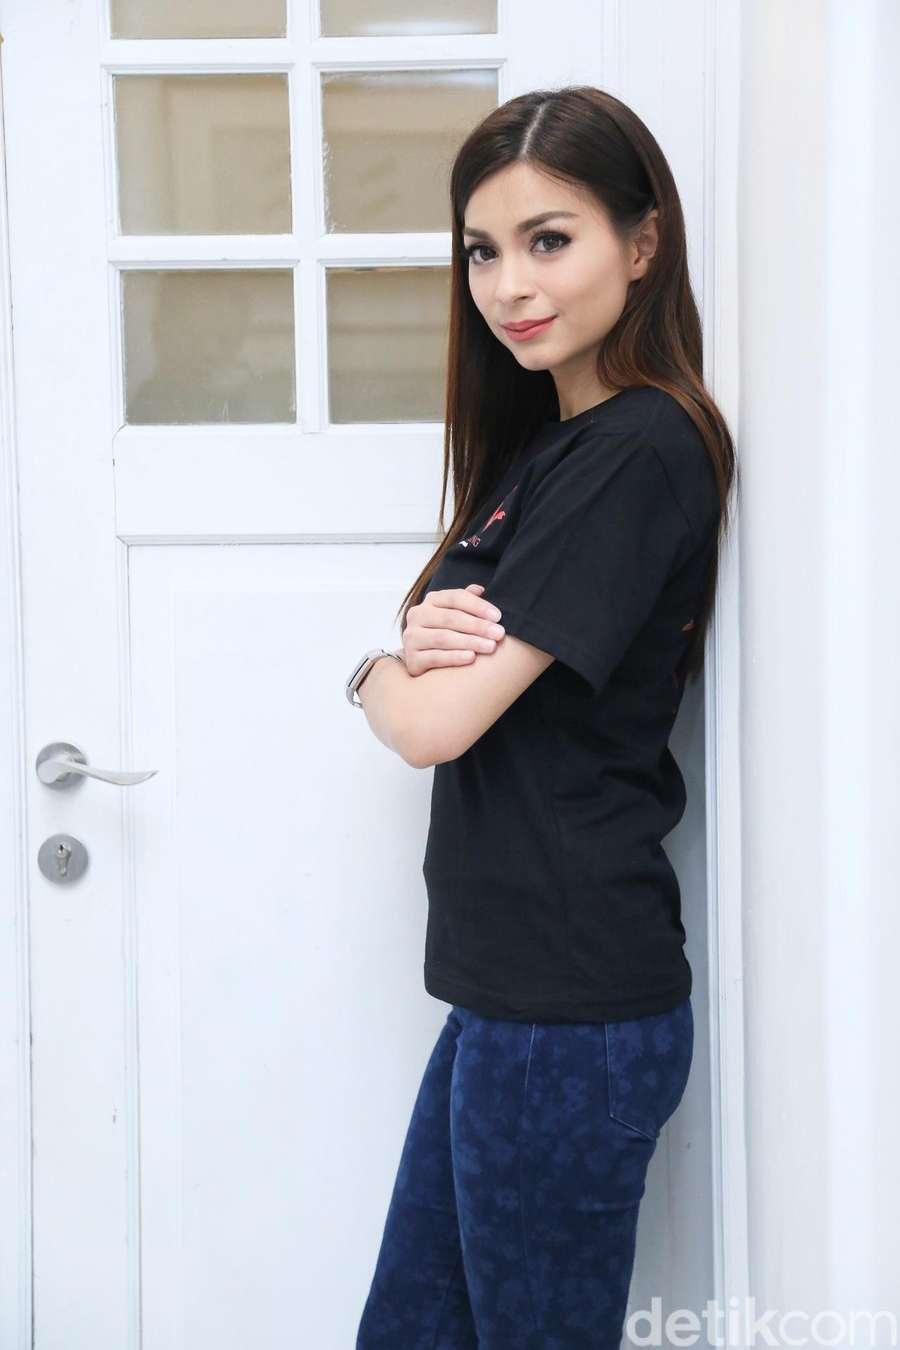 Sandra Olga, Cantik-cantik kok Dibully?